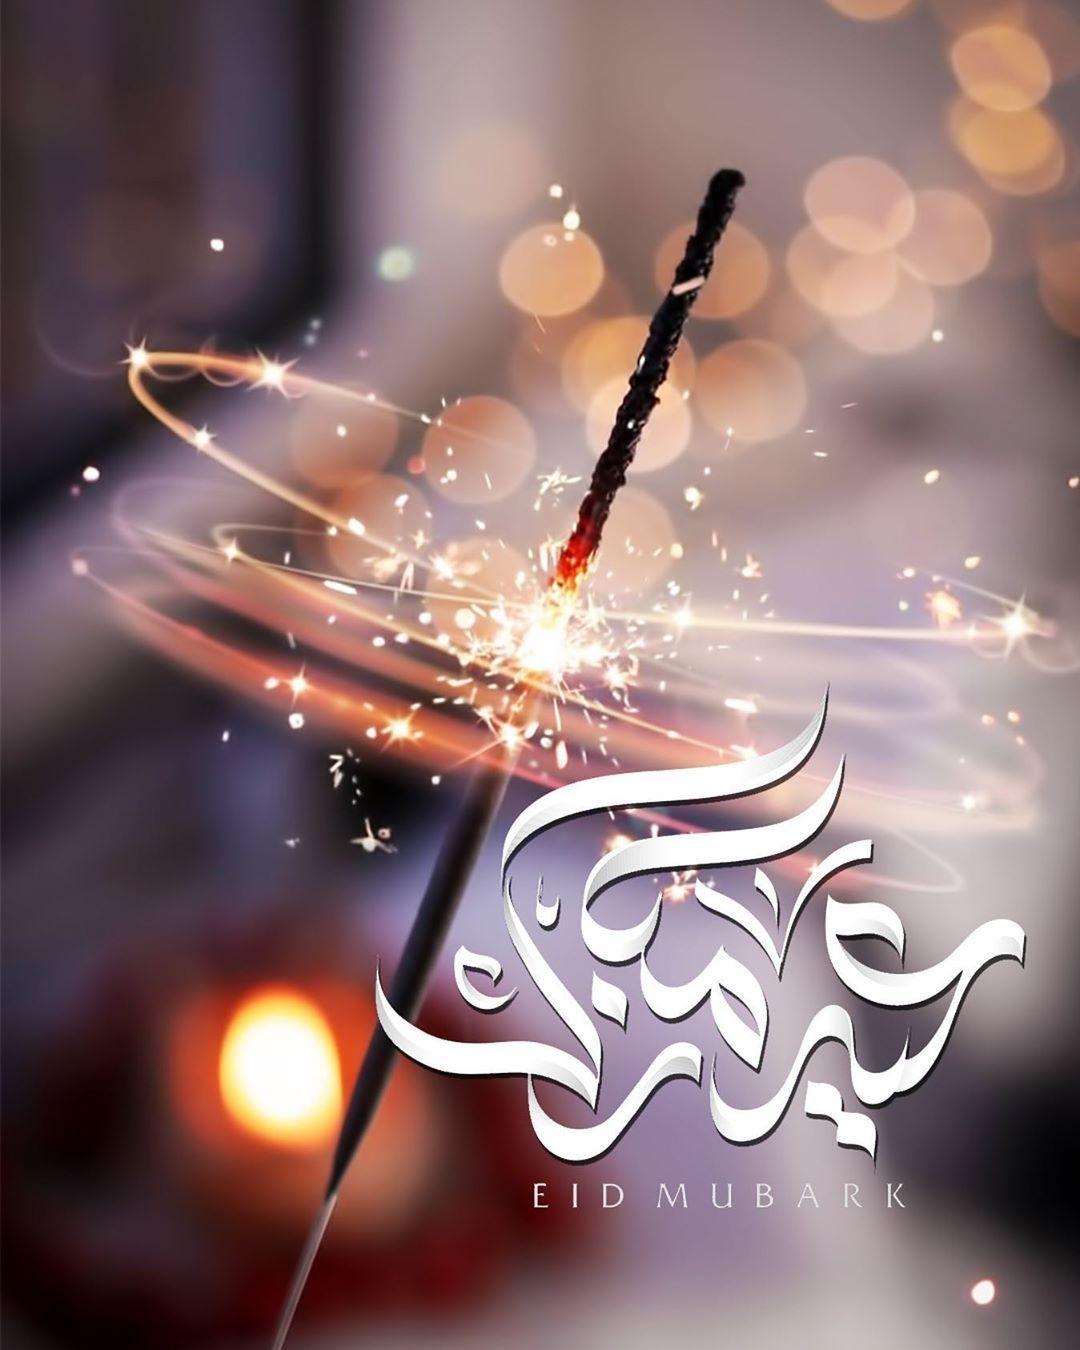 P E A R L A On Instagram ت صاميمي العيد من ه نا عيد ㅤ ㅤ ㅤㅤㅤㅤㅤ ㅤㅤㅤㅤㅤㅤㅤㅤㅤㅤㅤ ㅤ ㅤㅤㅤㅤㅤ ㅤㅤㅤㅤㅤㅤ ت Eid Greetings Eid Images Eid Mubarak Greetings